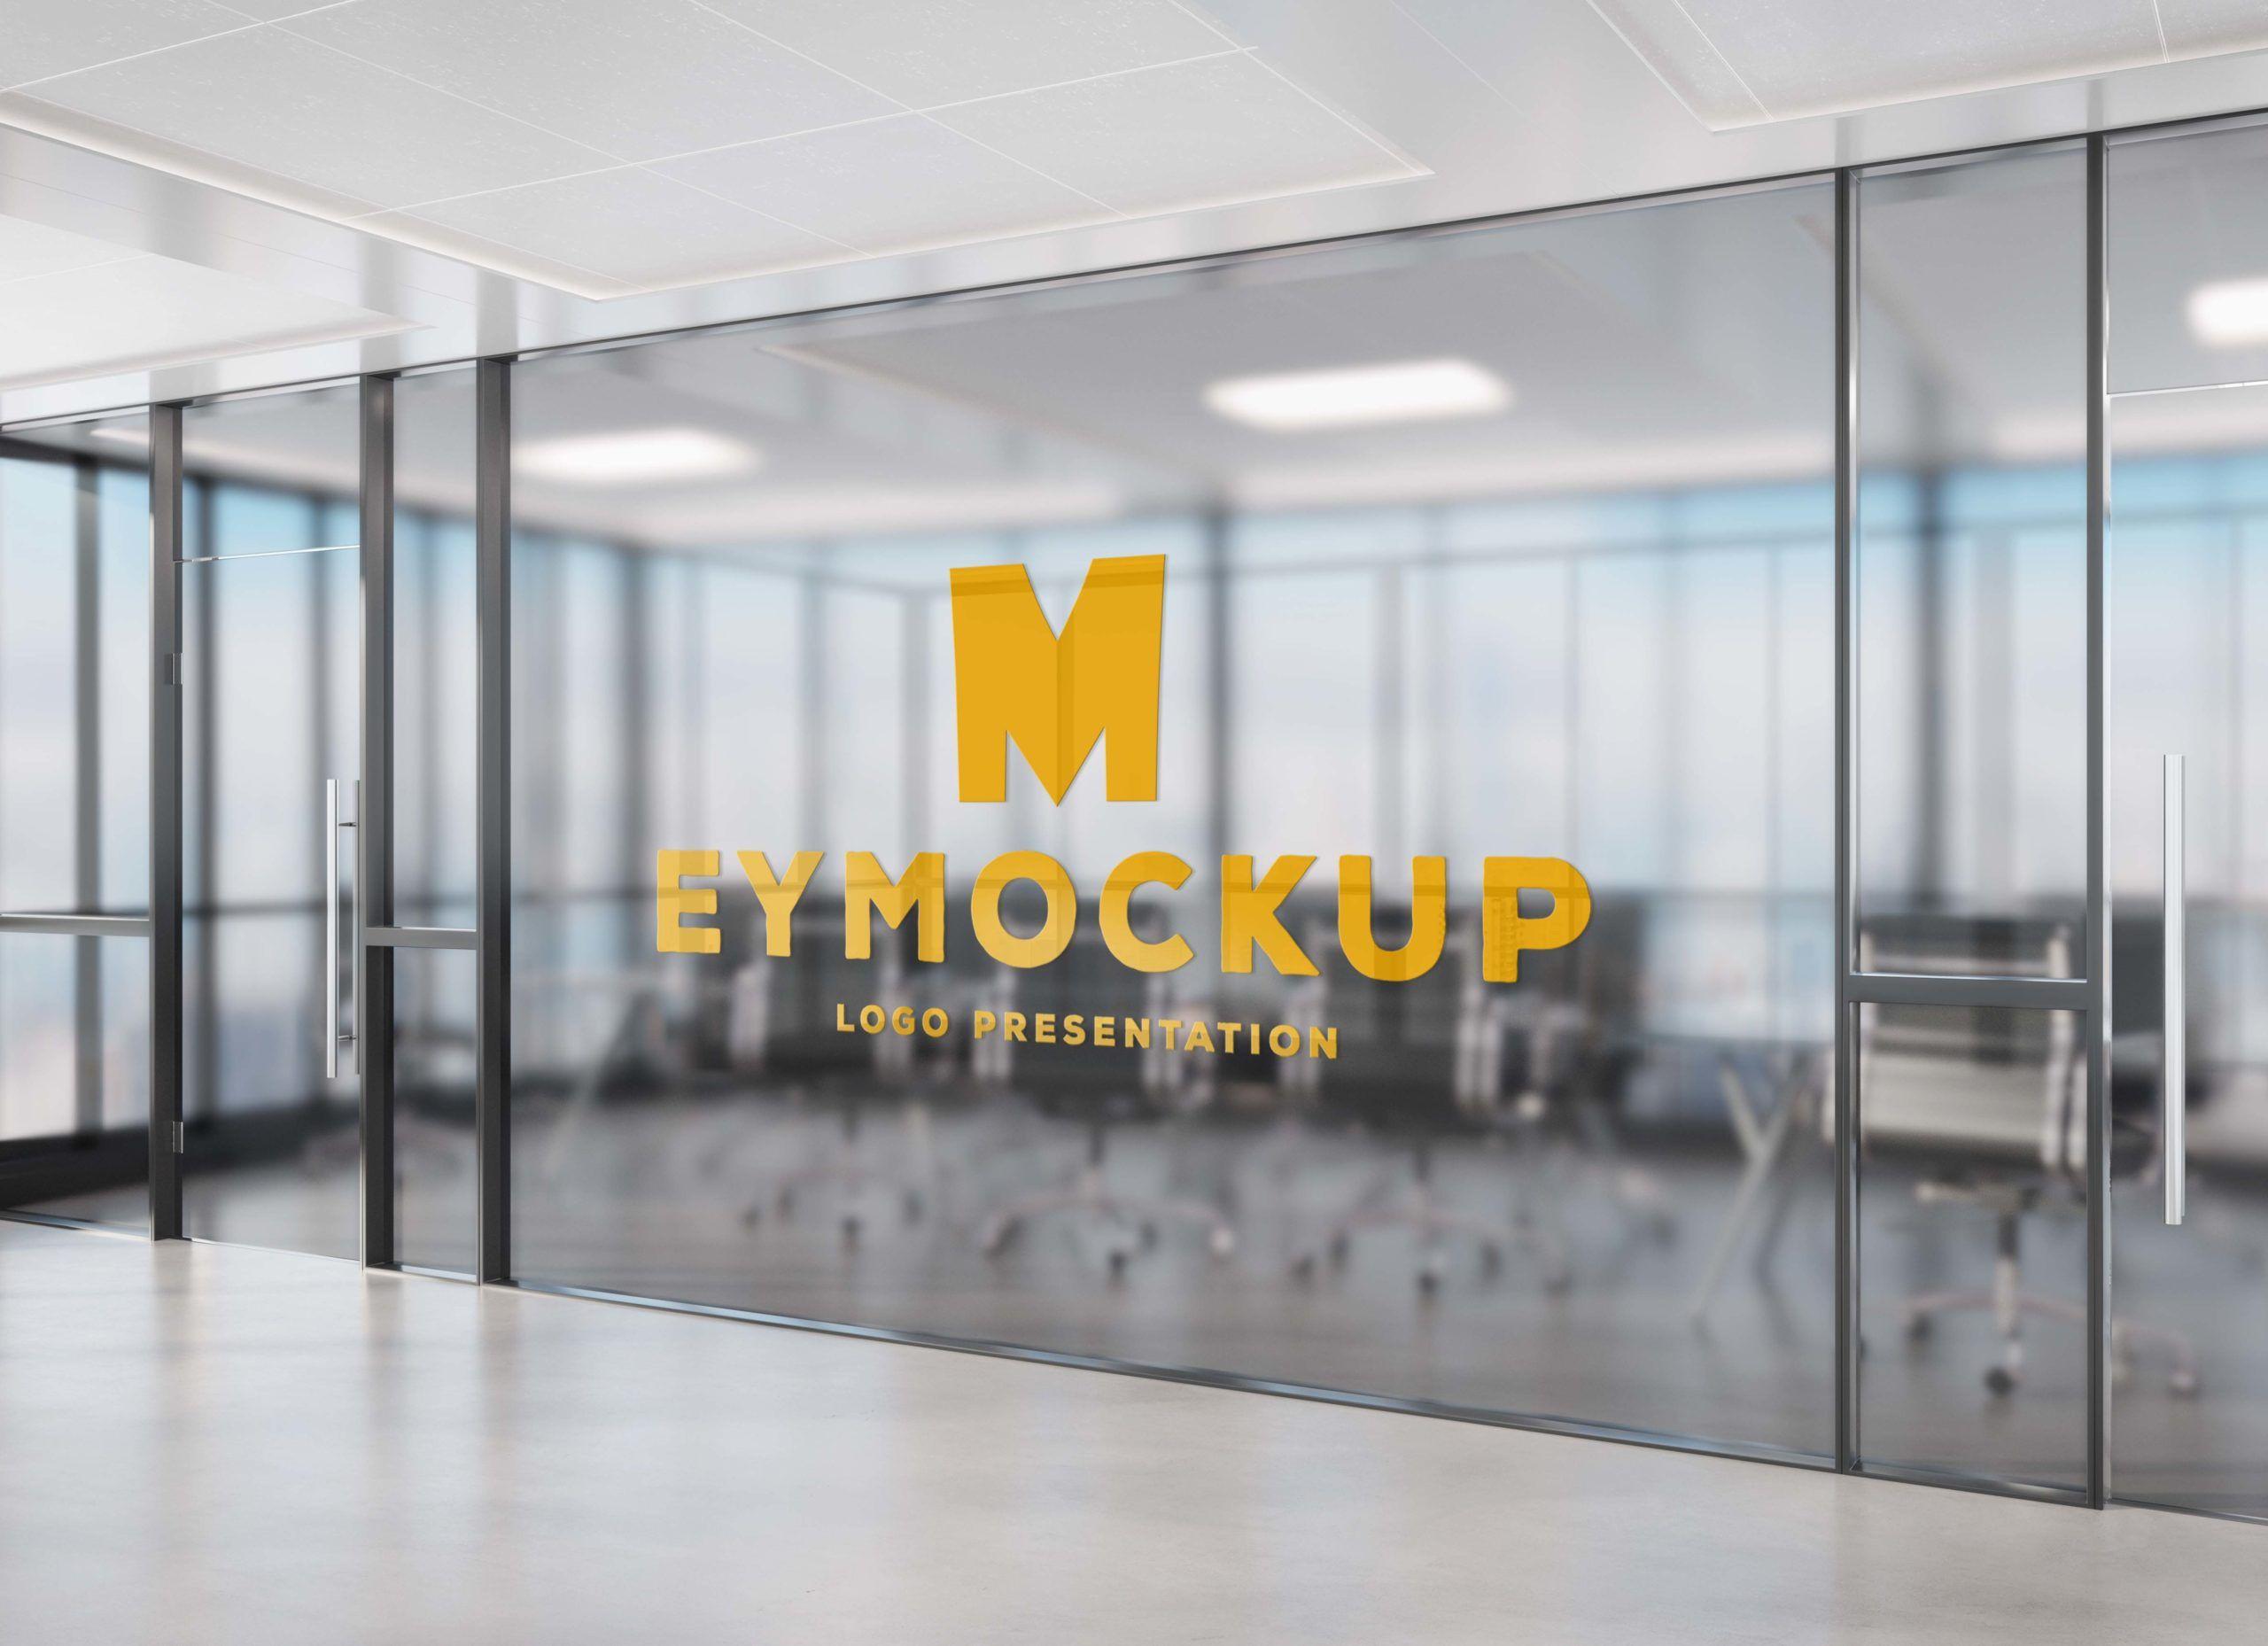 Transparent Office Wall Logo Free Psd Mockup Free Logo Mockup Mockup Free Psd Logo Mockup